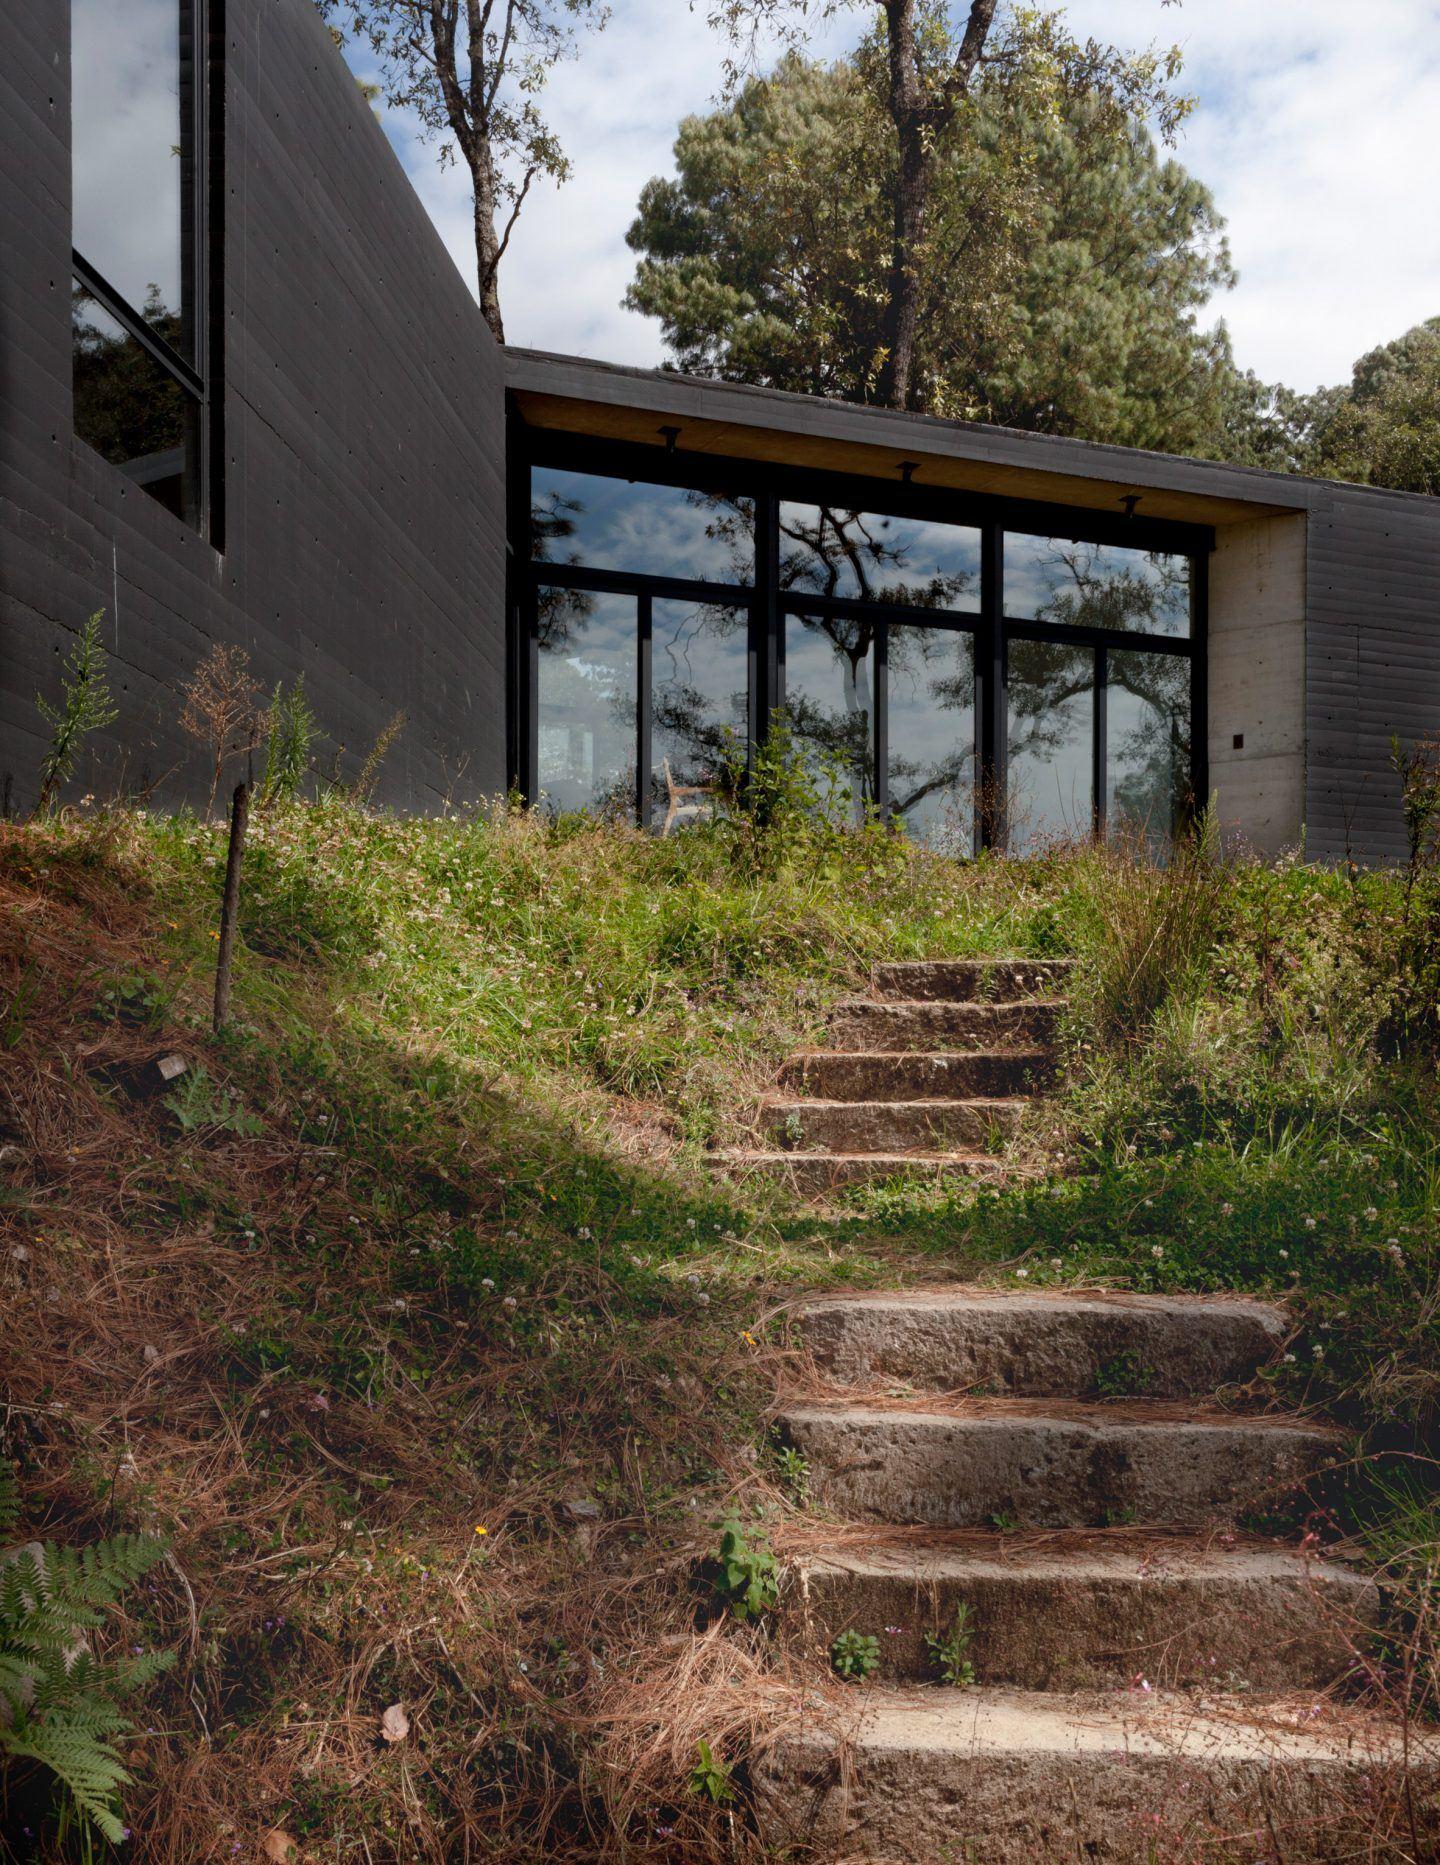 IGNANT-Architecture-Cadaval-Sola-Morales-Casa-De-La-Roca-16